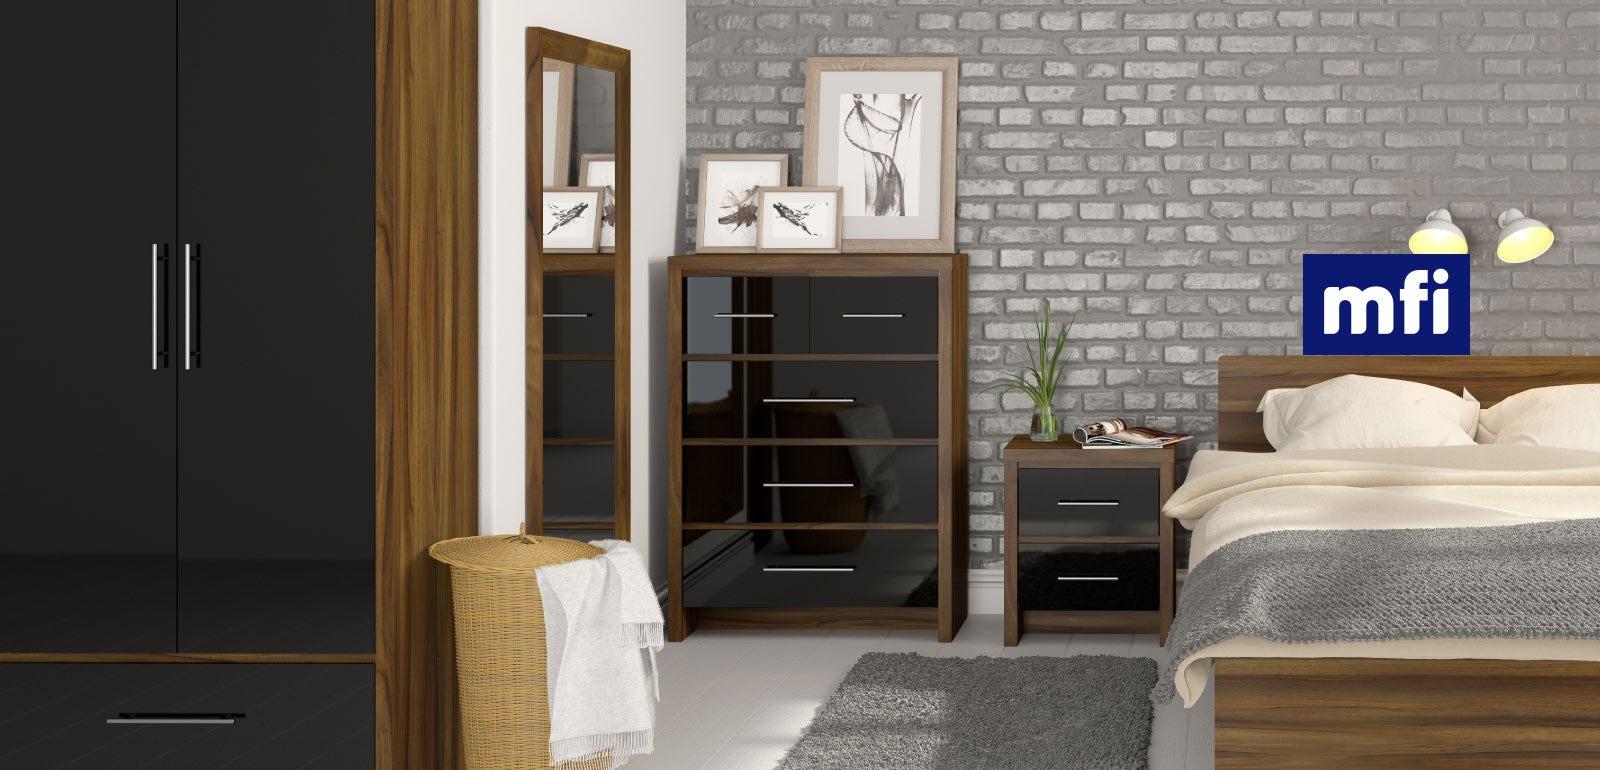 The mfi bedroom furniture collection VictoriaPlumcom